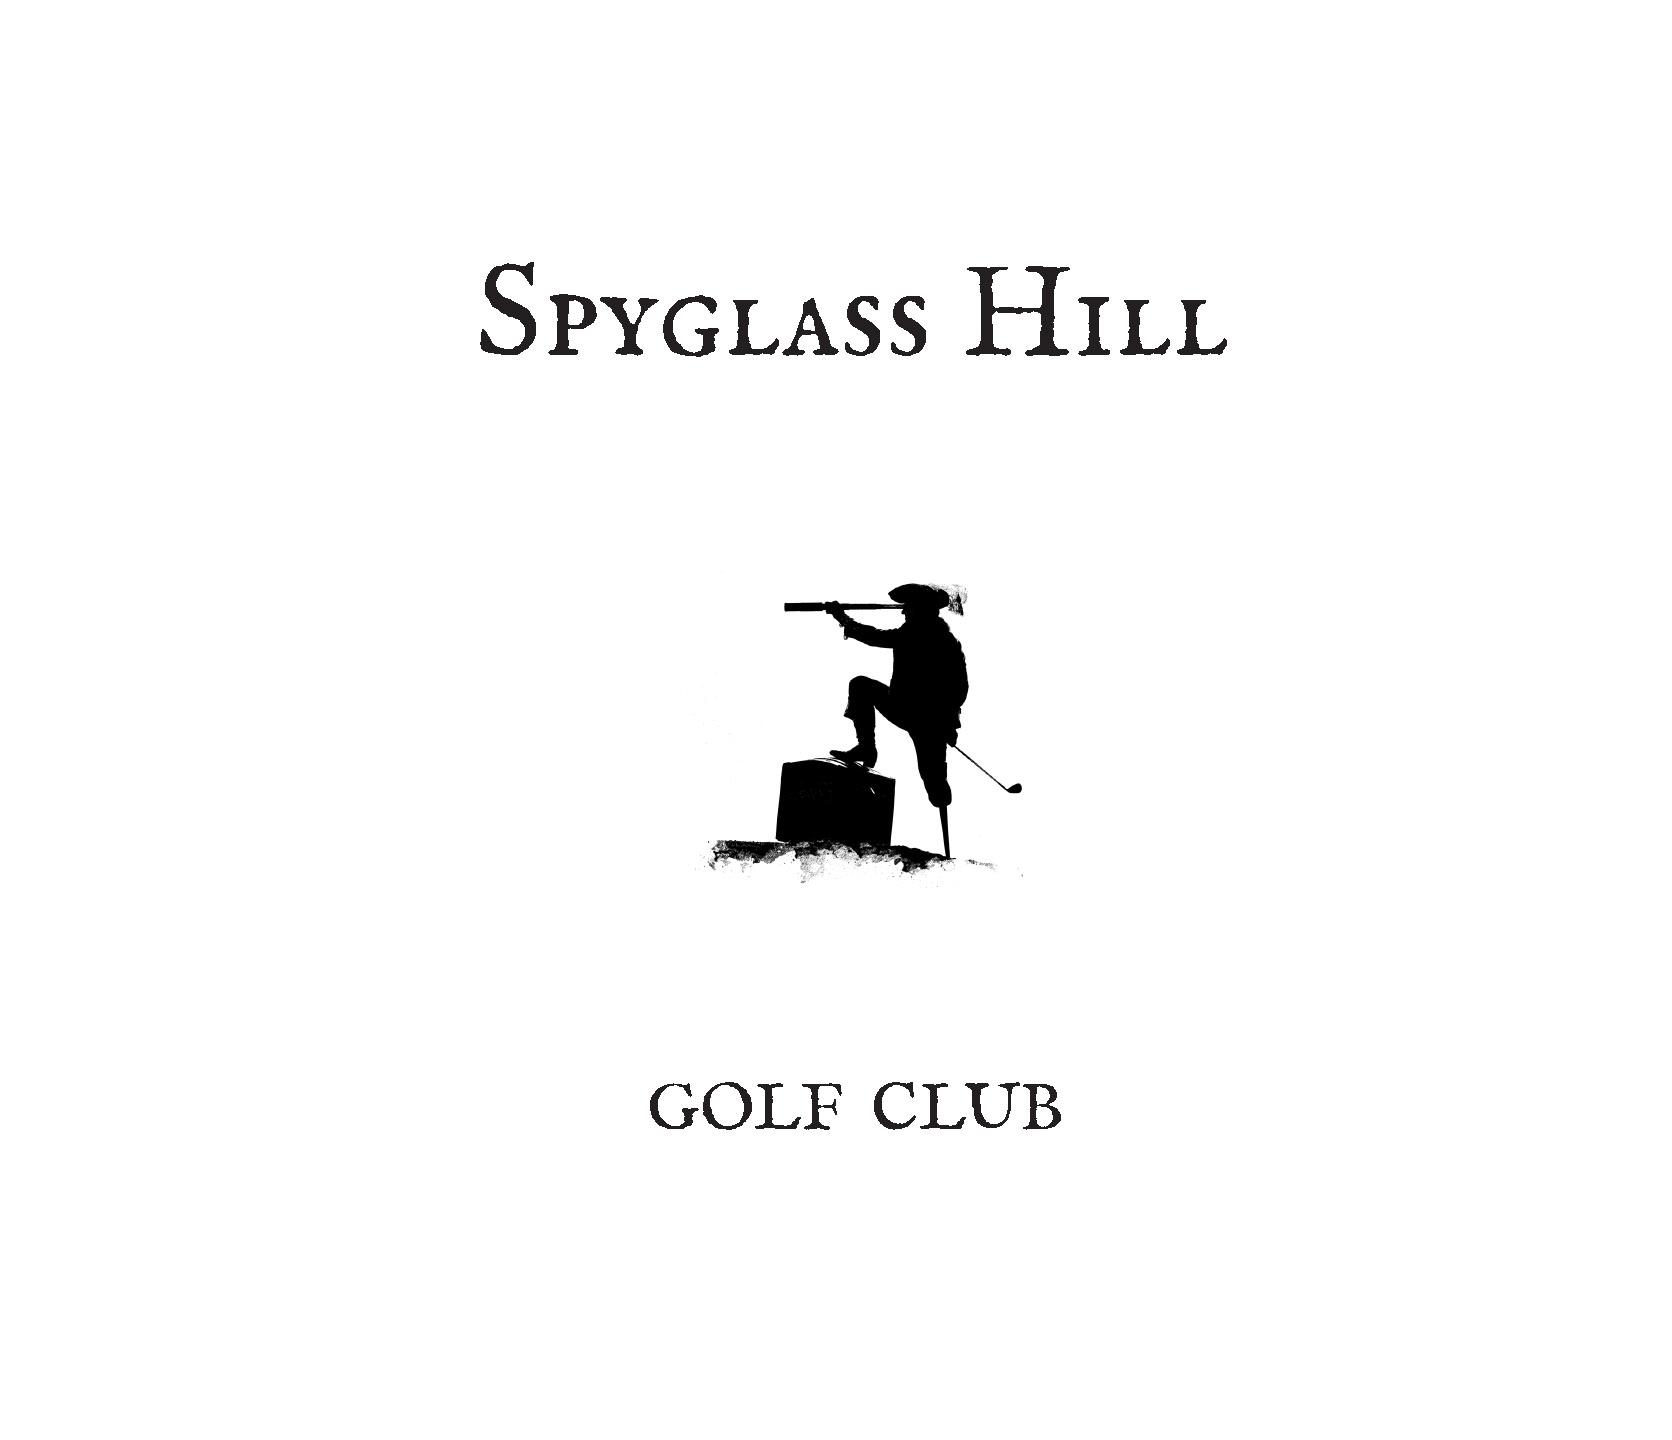 SpyglassHill_01-1